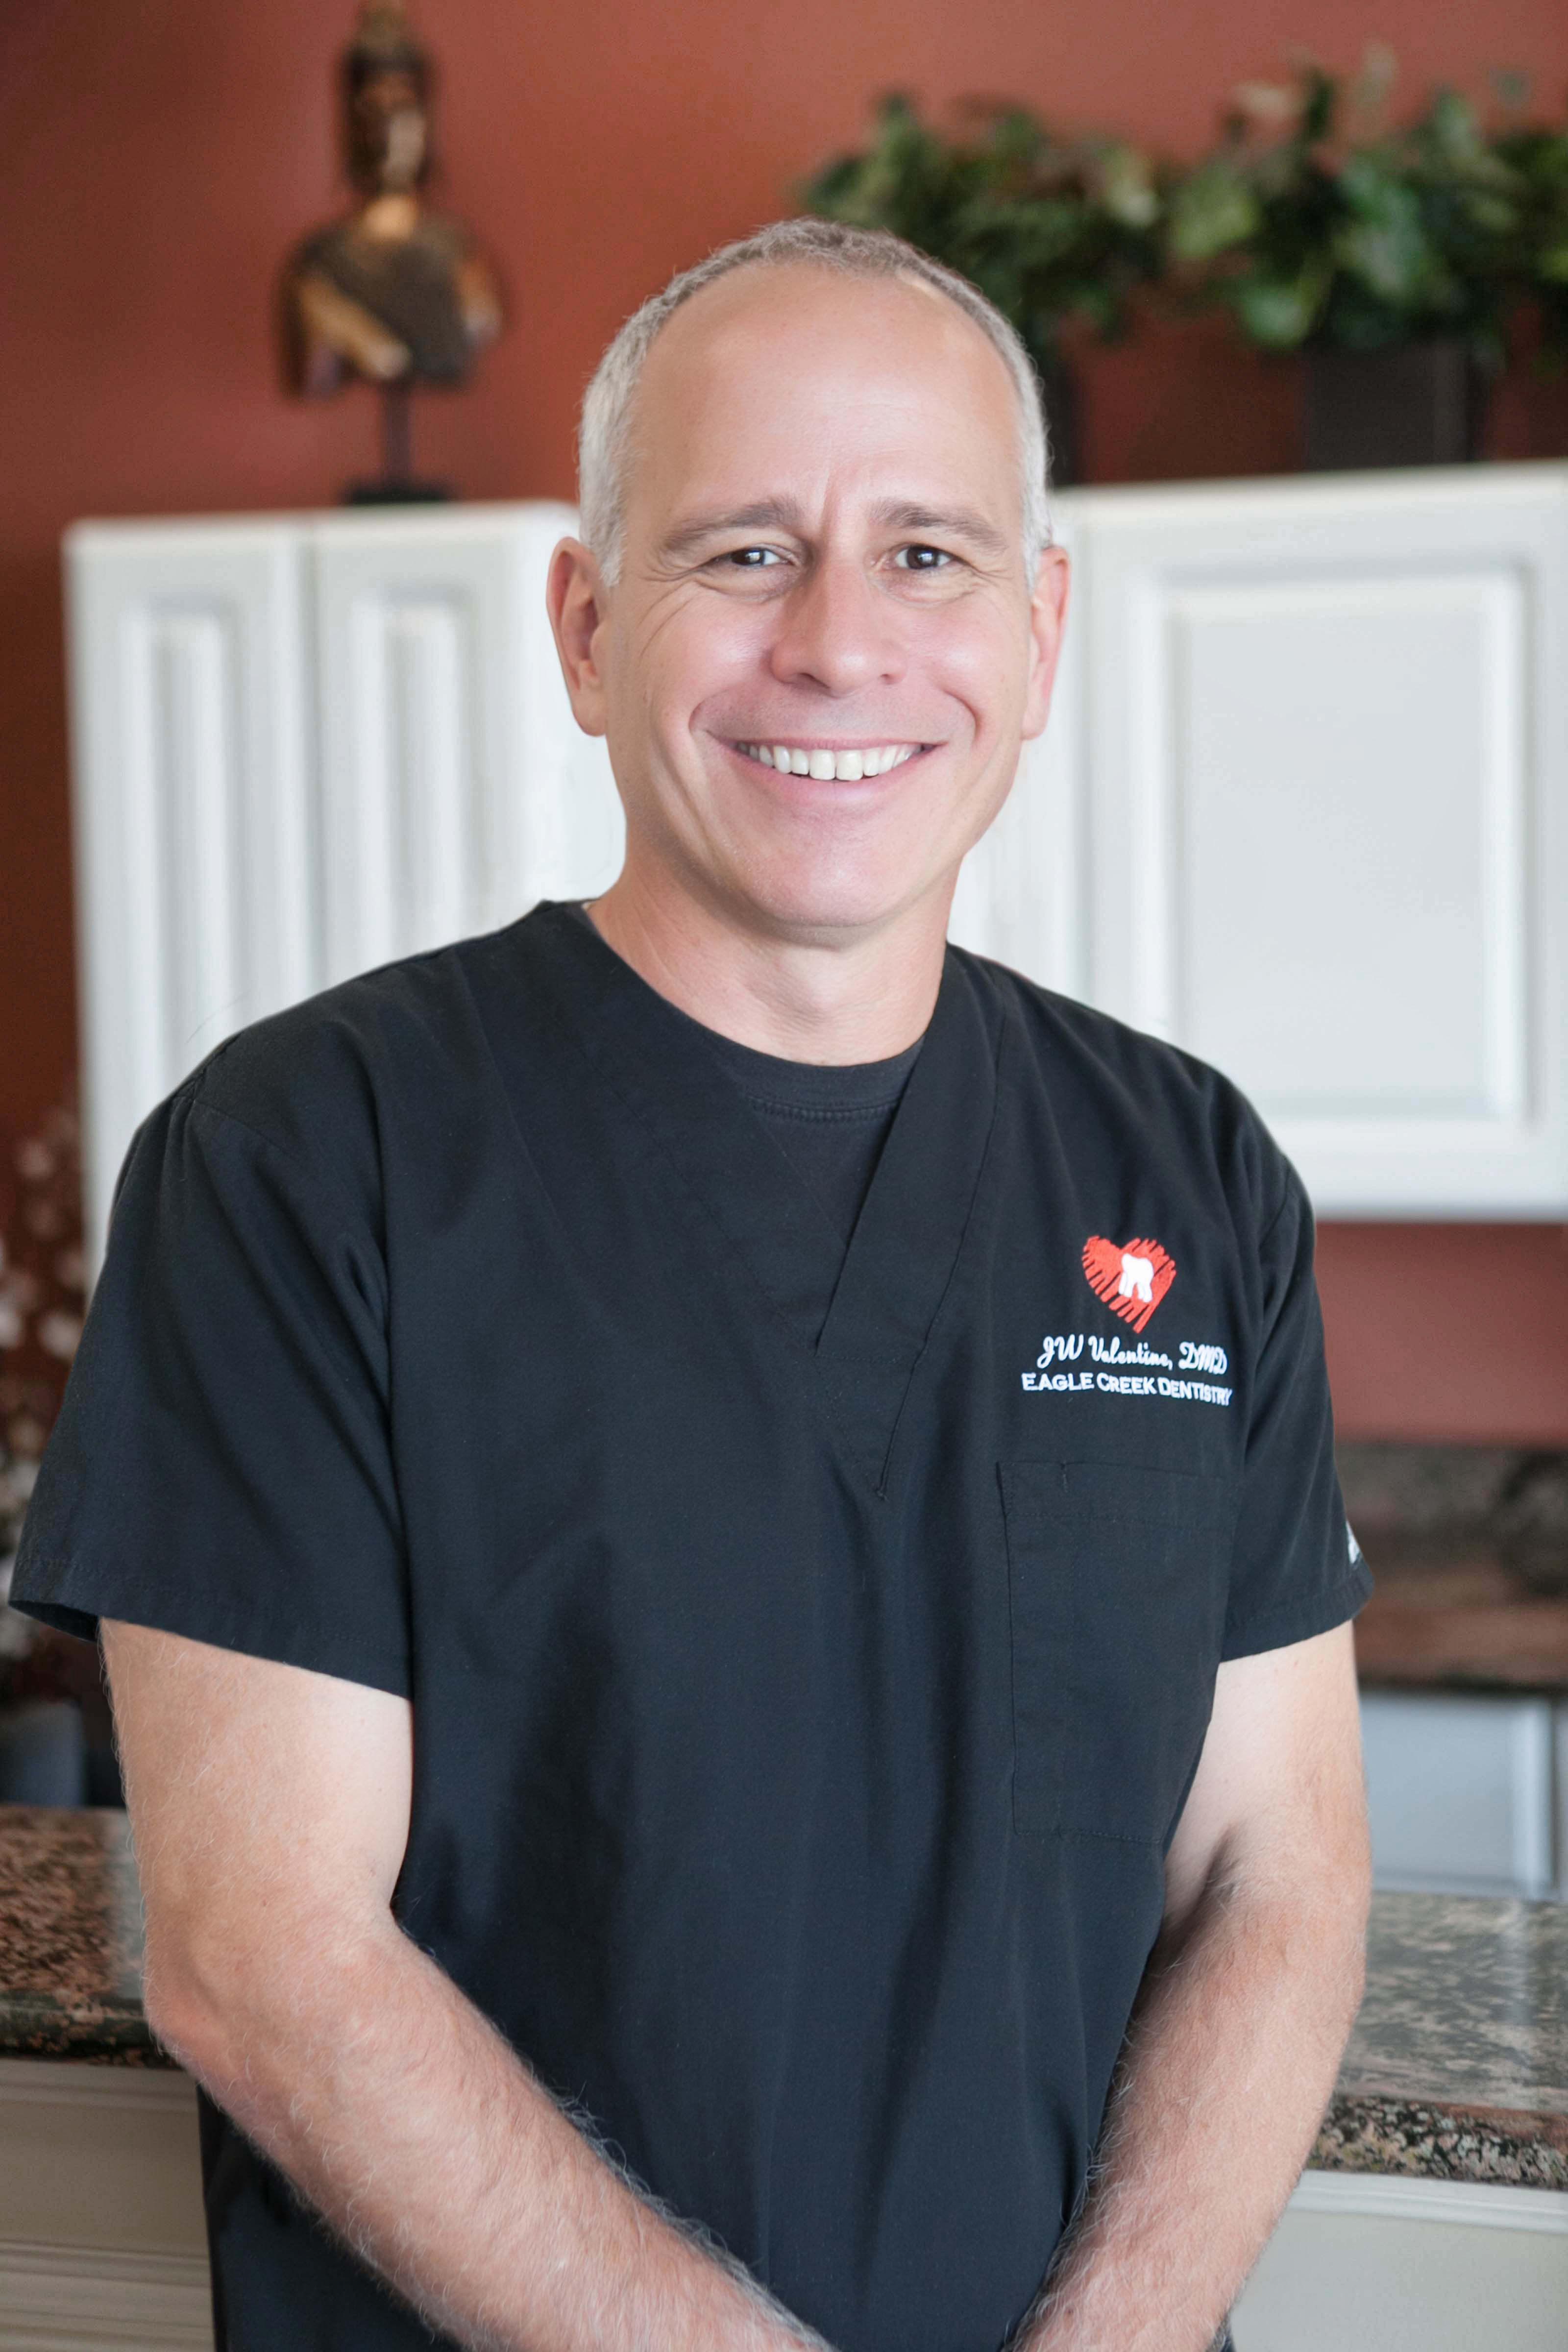 John W Valentine General Dentistry